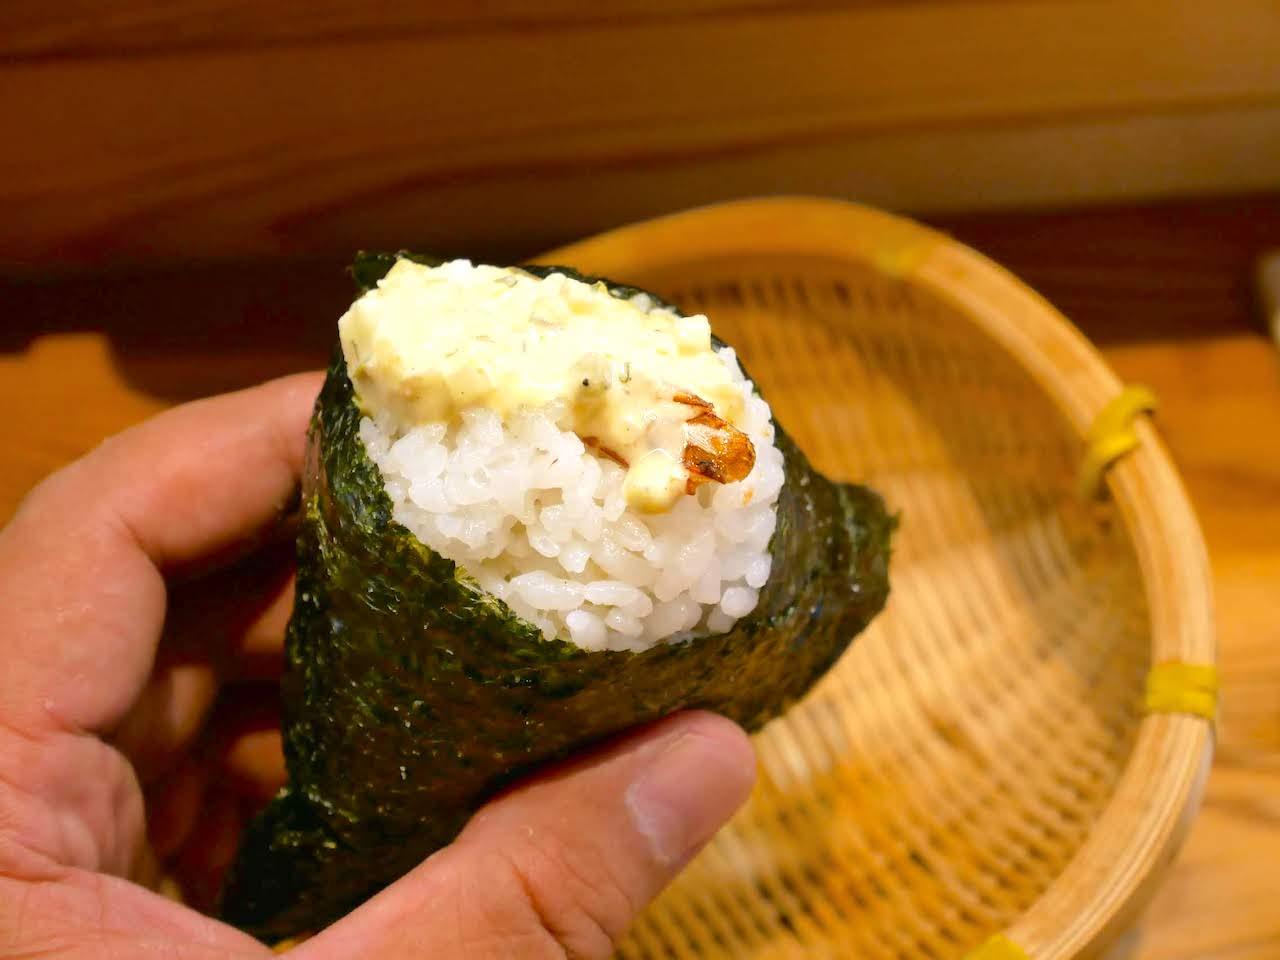 http://morning.tokyo-review.com/images/1150928.jpg